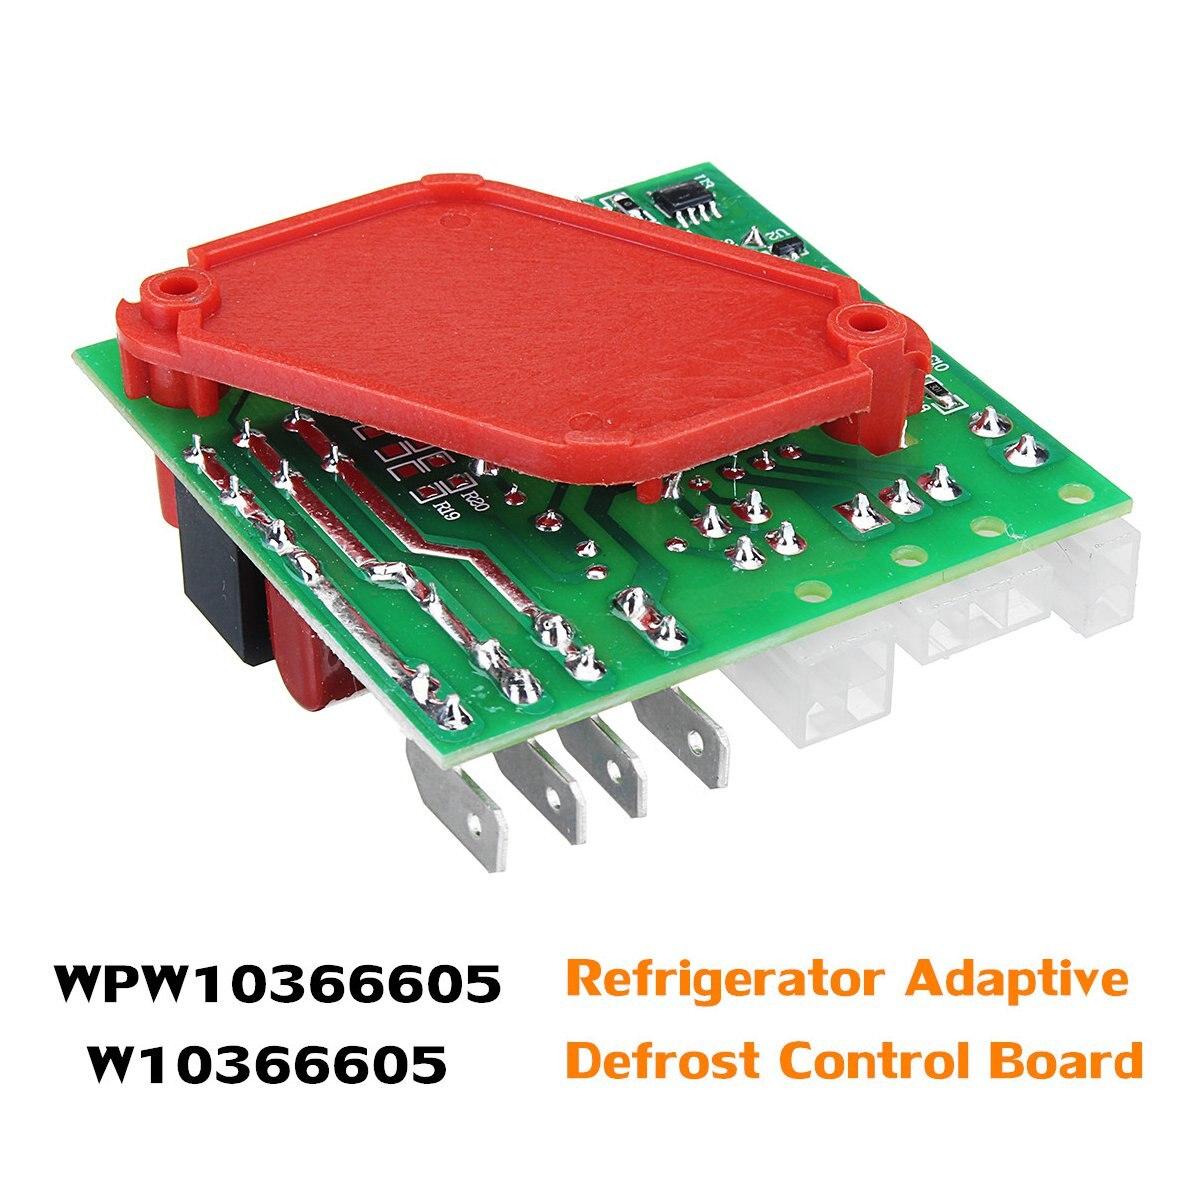 WPW10366605 Refrigerator Adaptive Defrost Control Board For Whirlpool W10366605 adaptive neurofuzzy control paradigms page 8